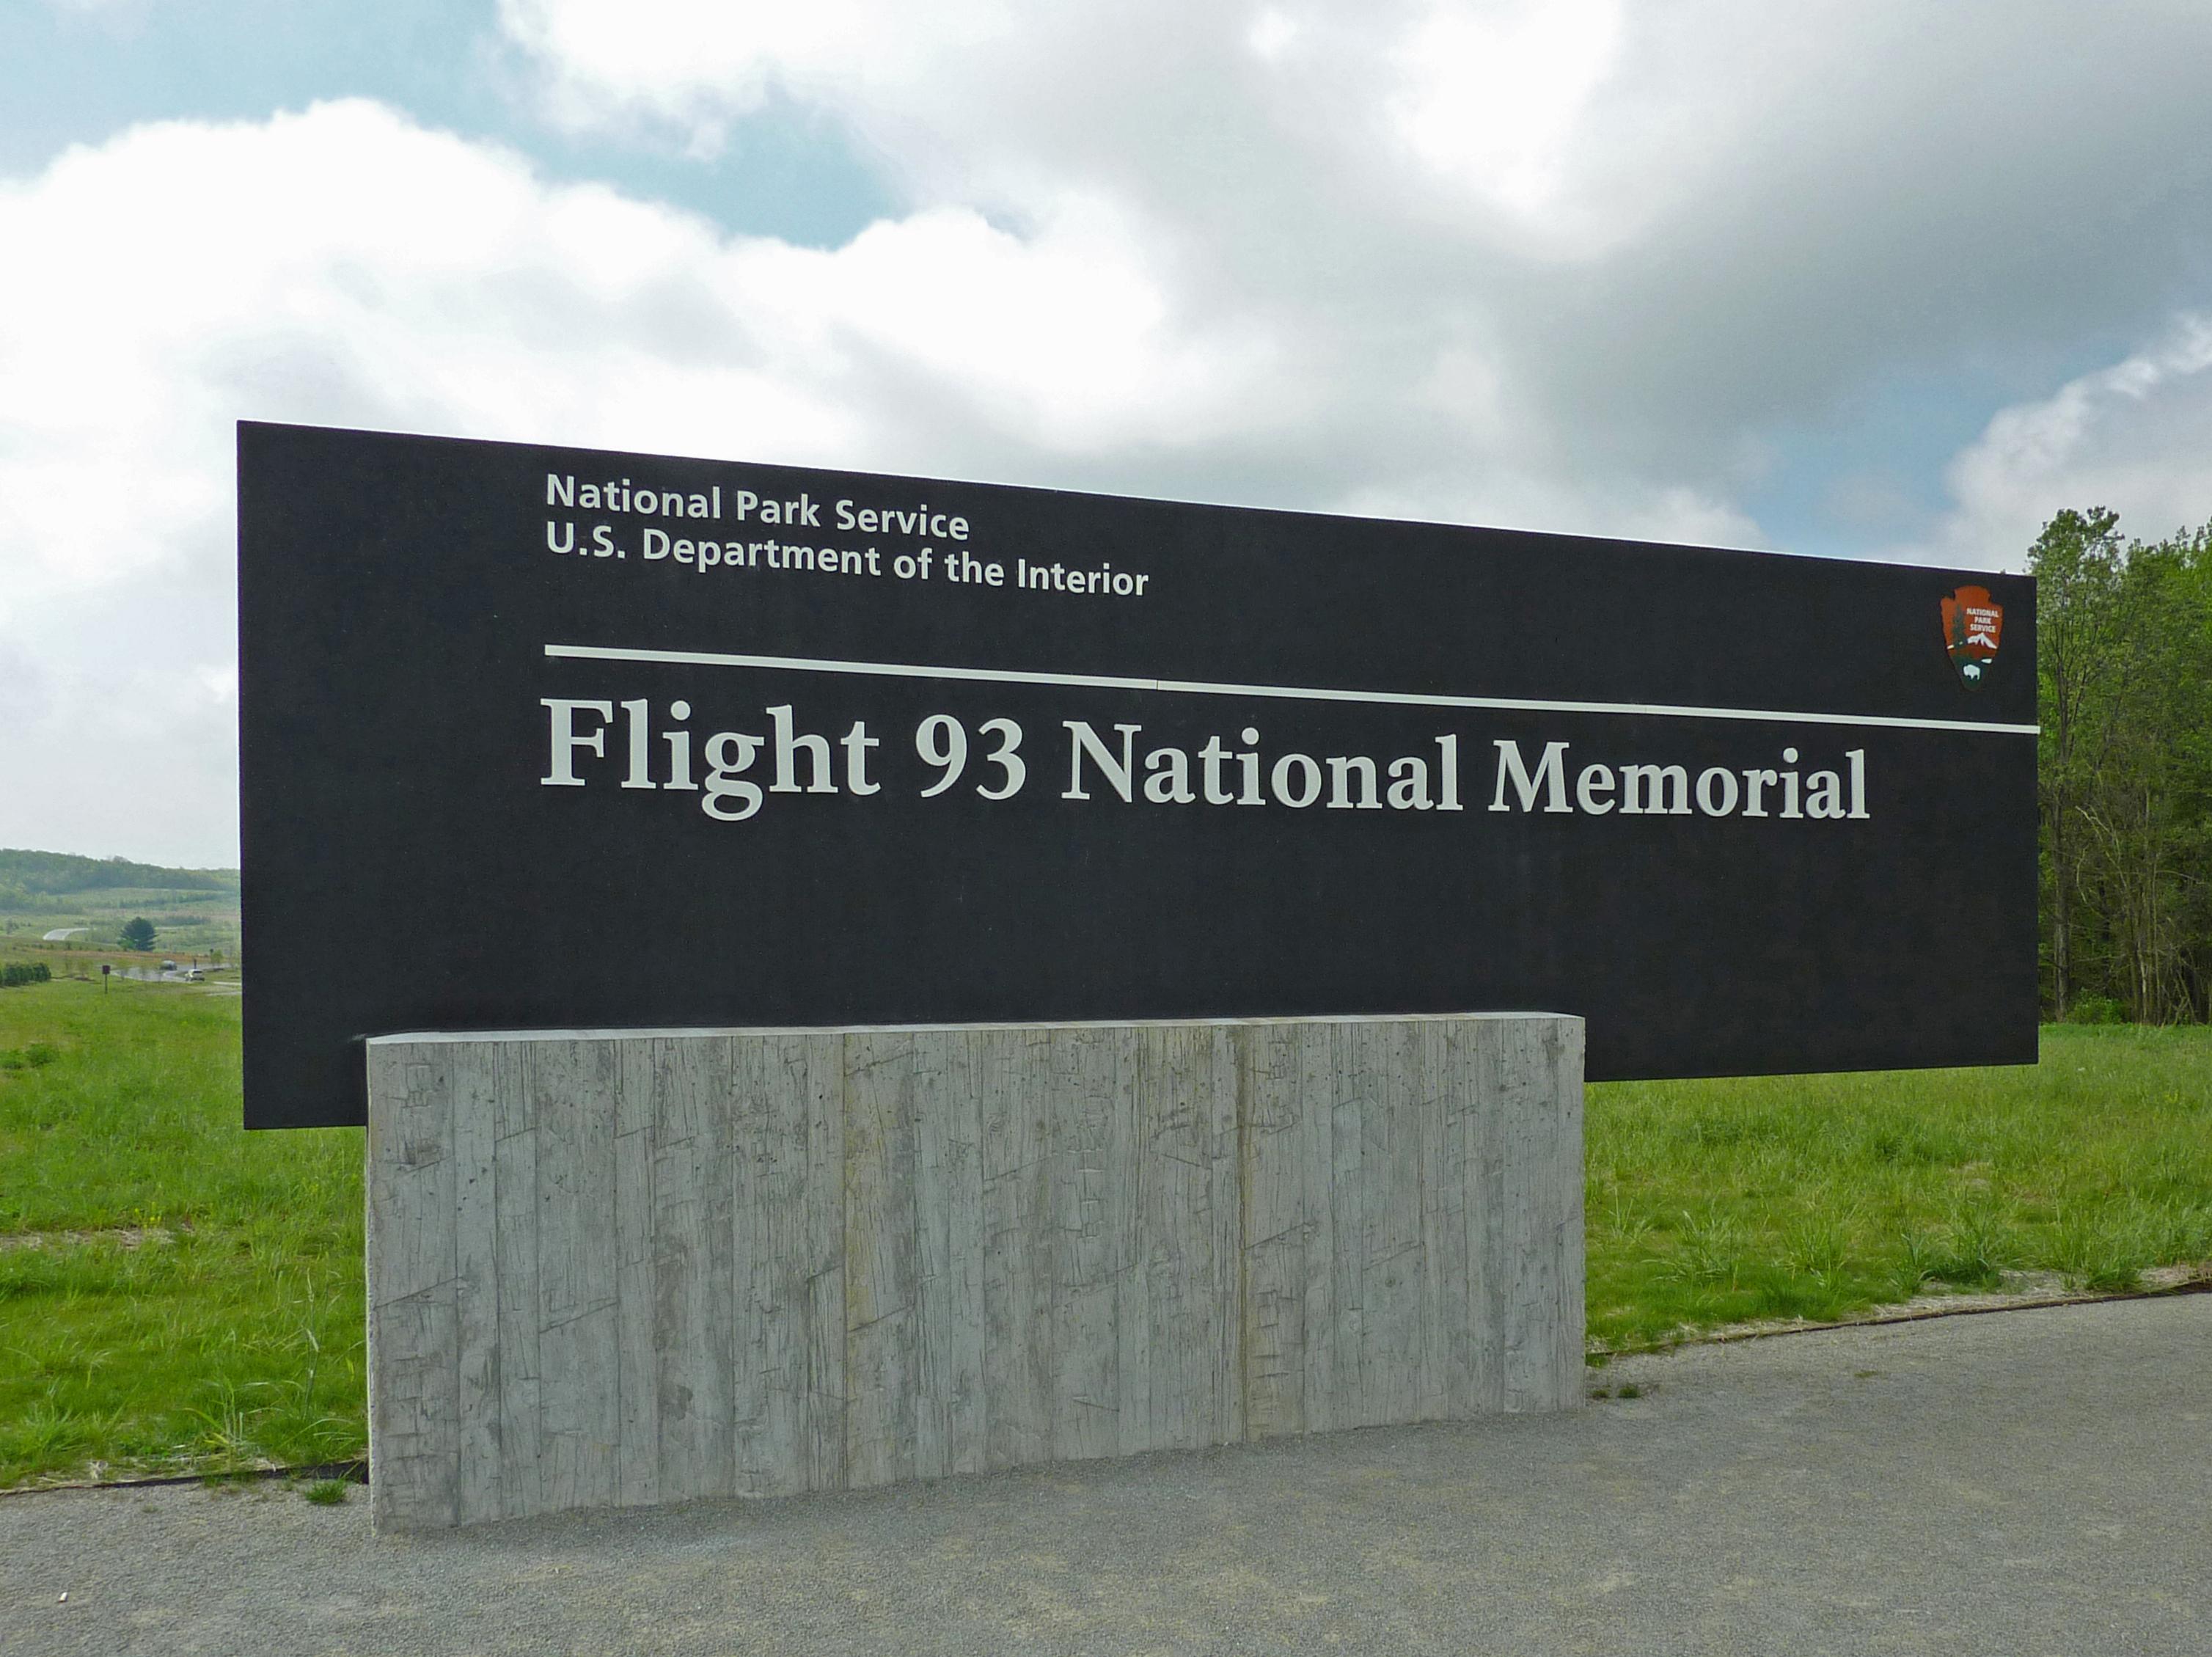 A_tour_of_the_Flight_93_National_Memorial_-_01